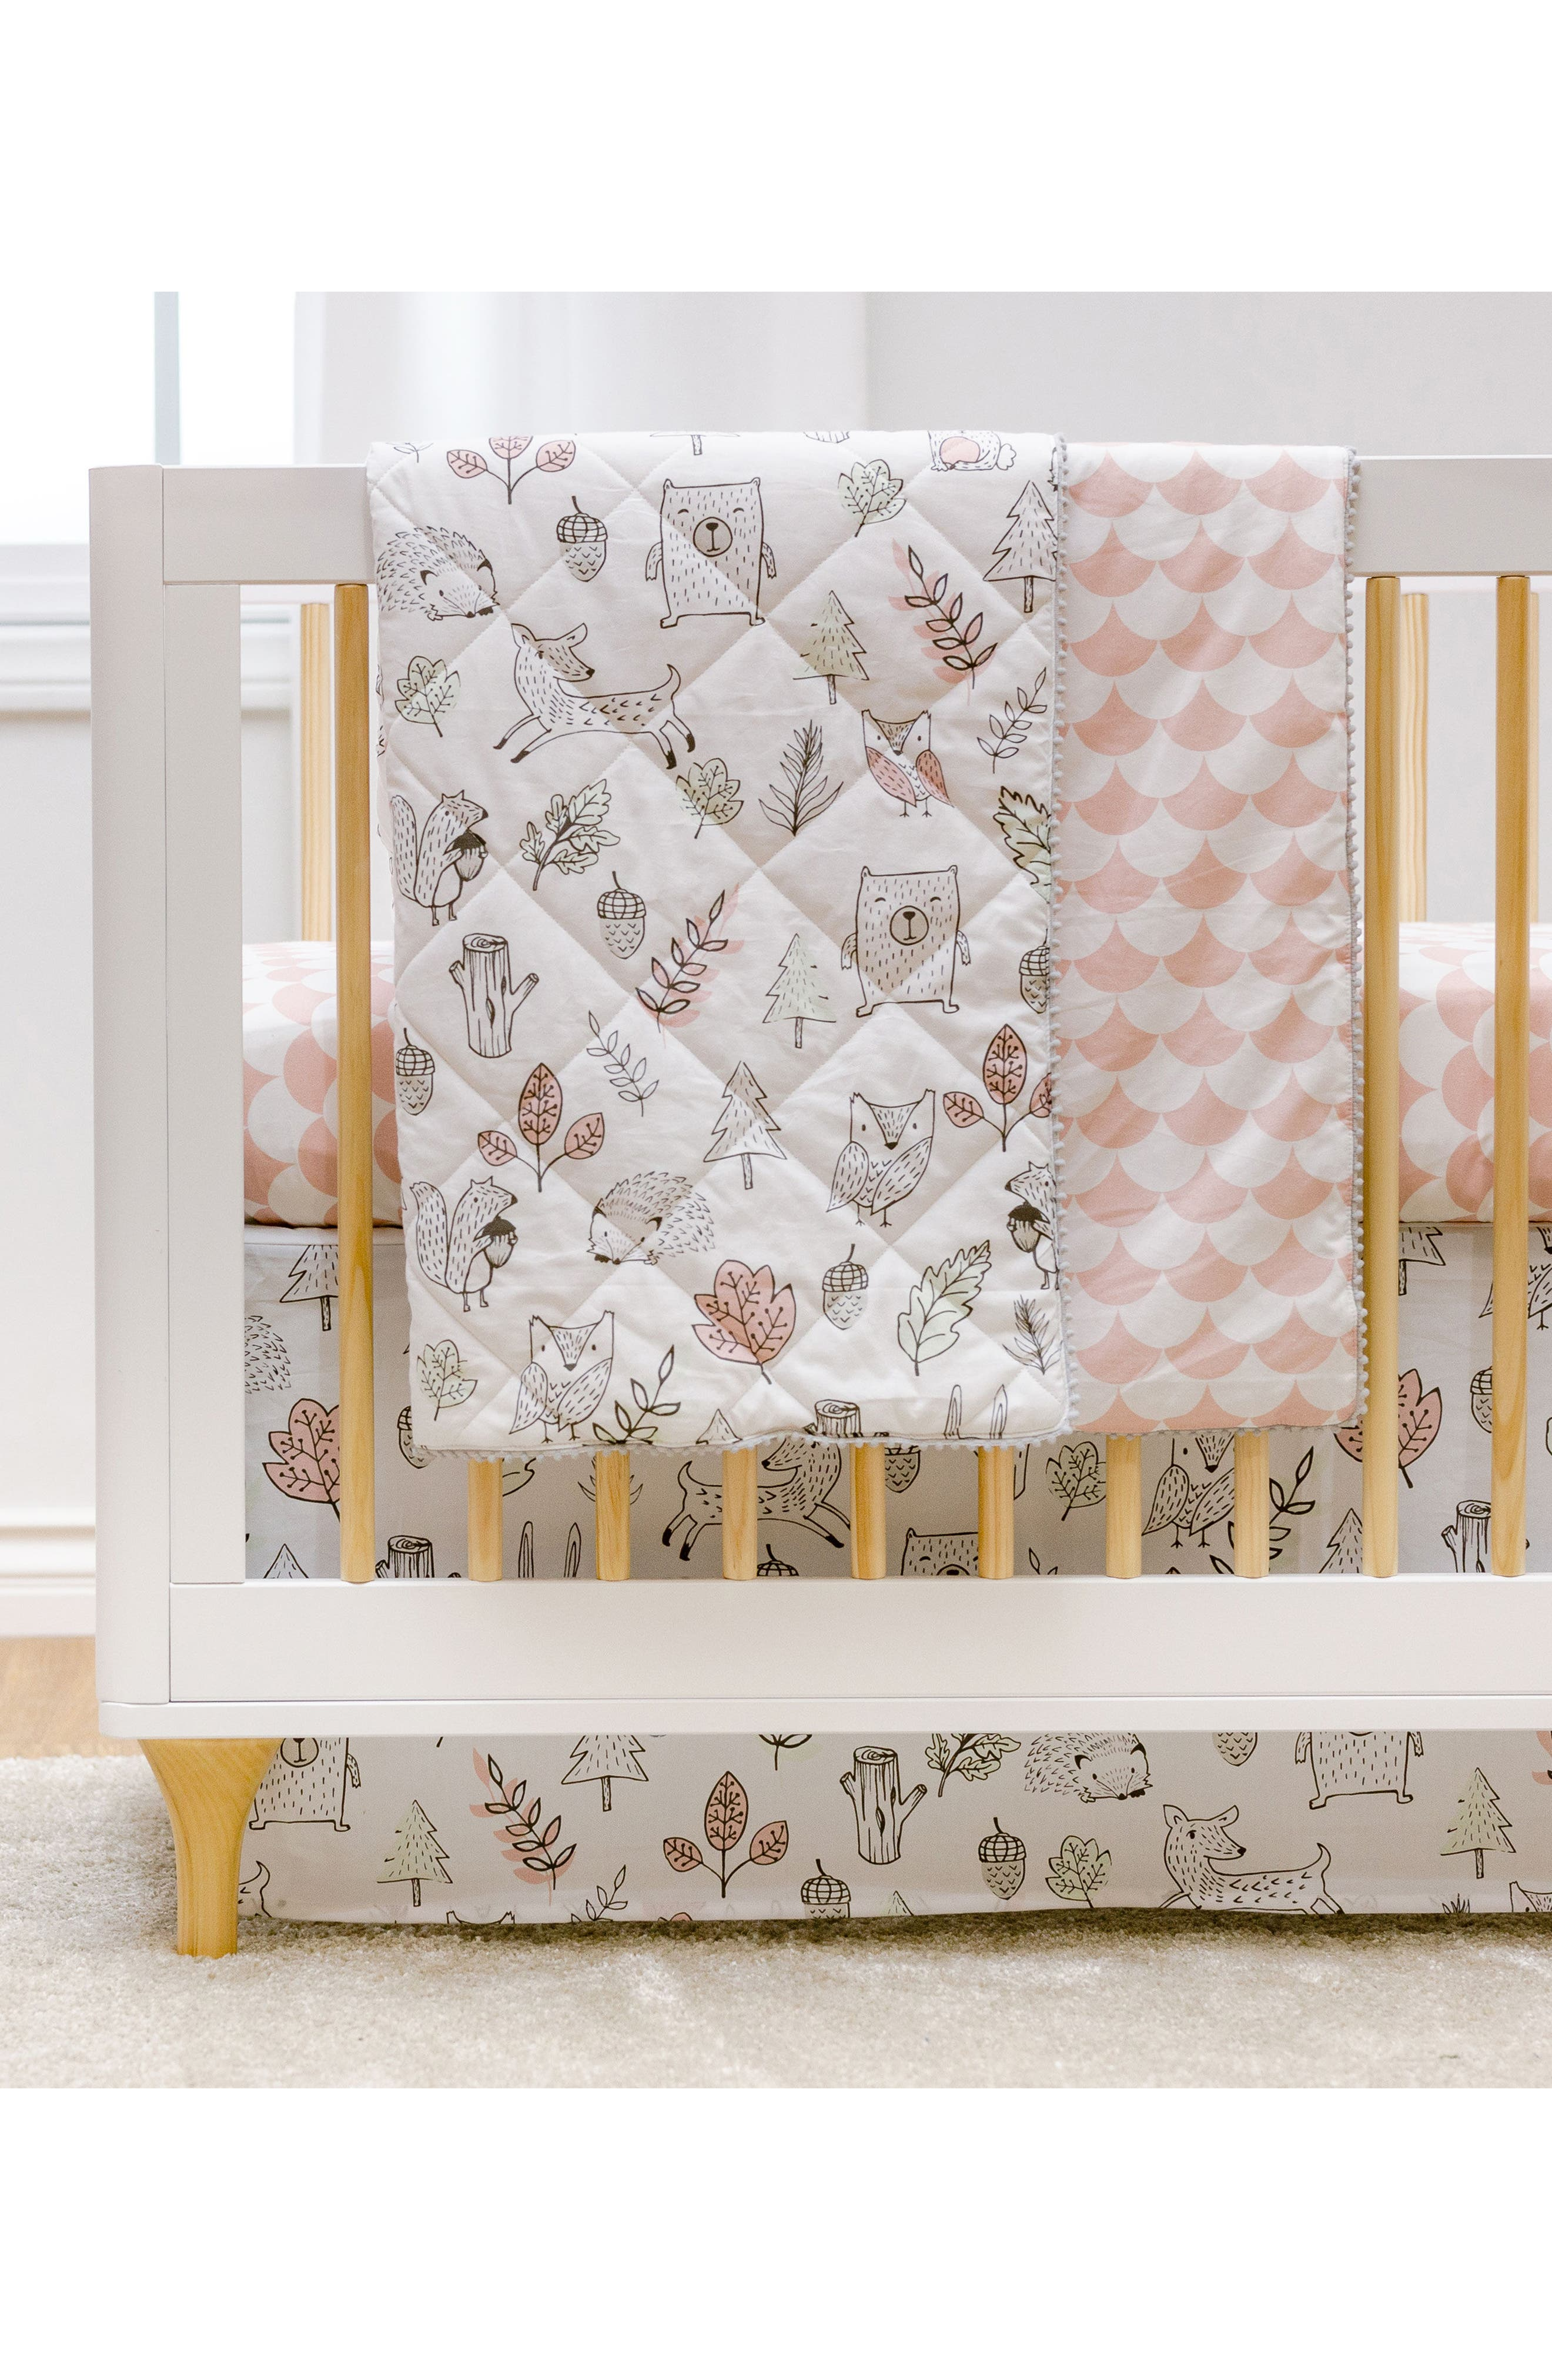 Woodlands 4-Piece Crib Bedding Set,                             Alternate thumbnail 10, color,                             KAYDEN - WOODLANDS